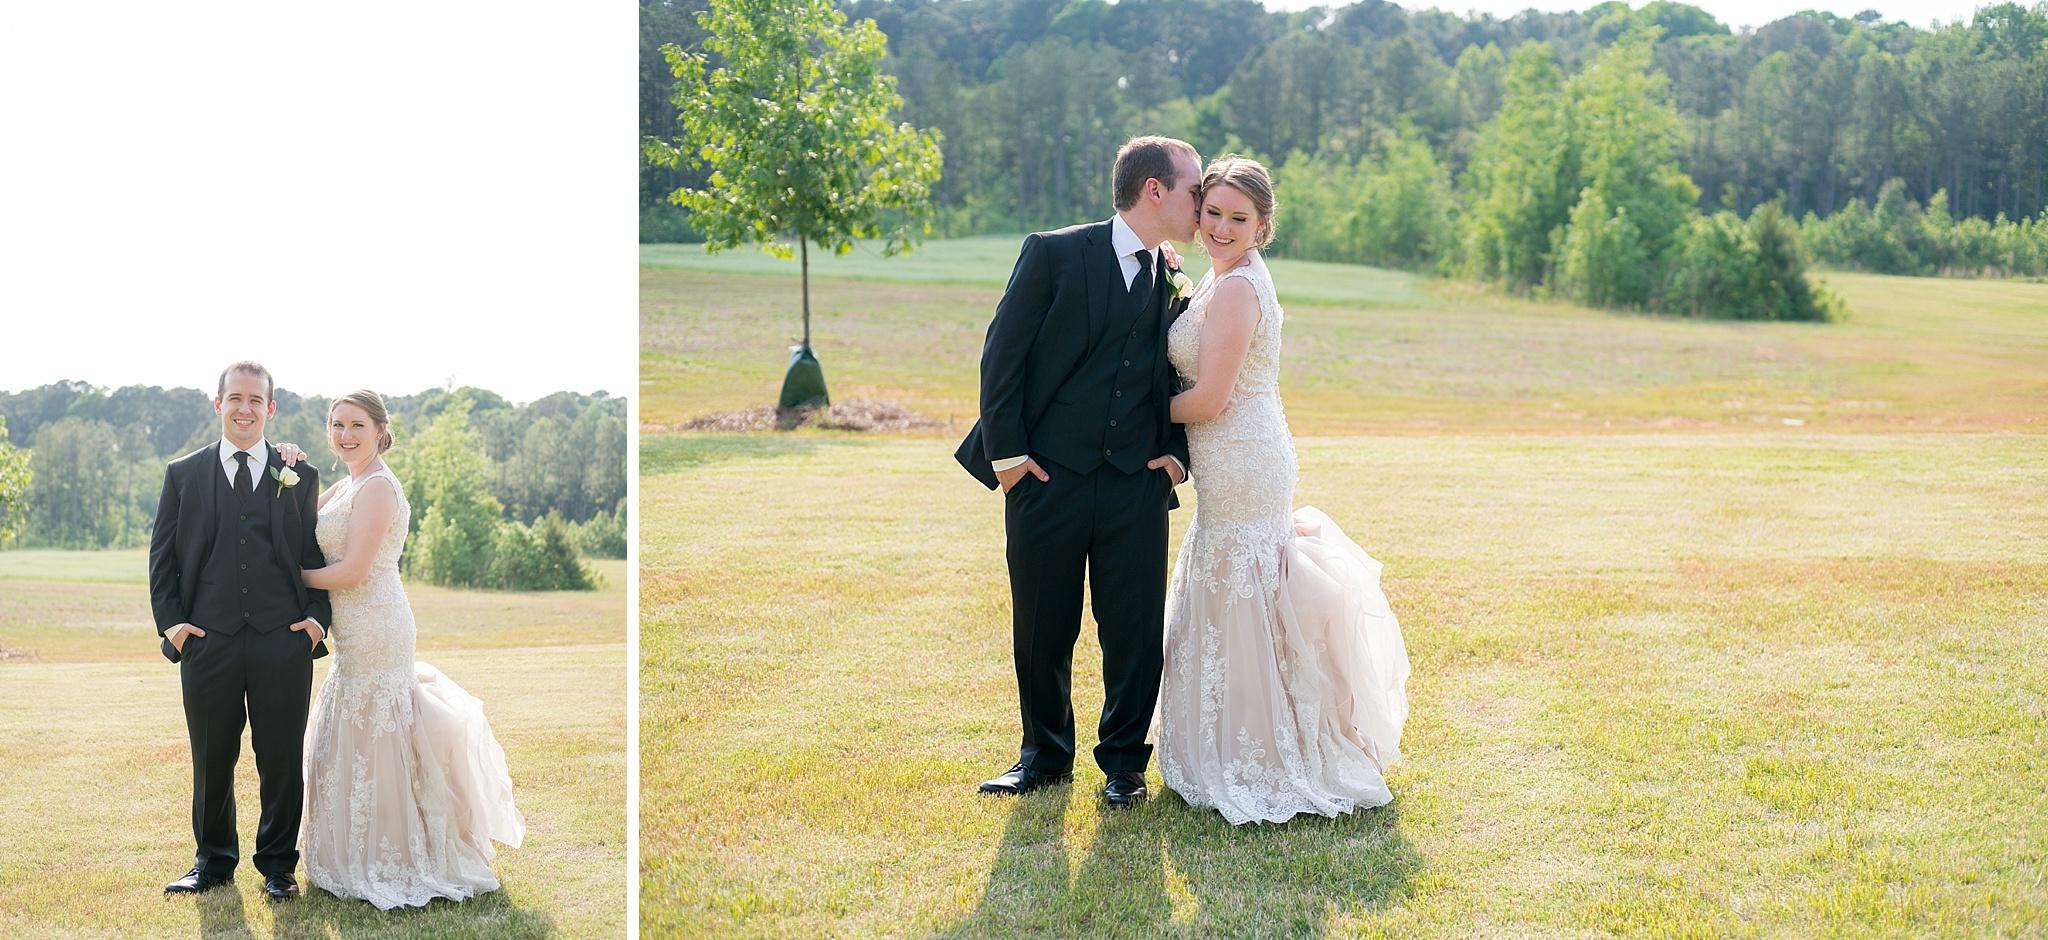 Pavilion-Carriage-Farms-Wedding-Photographer-196.jpg